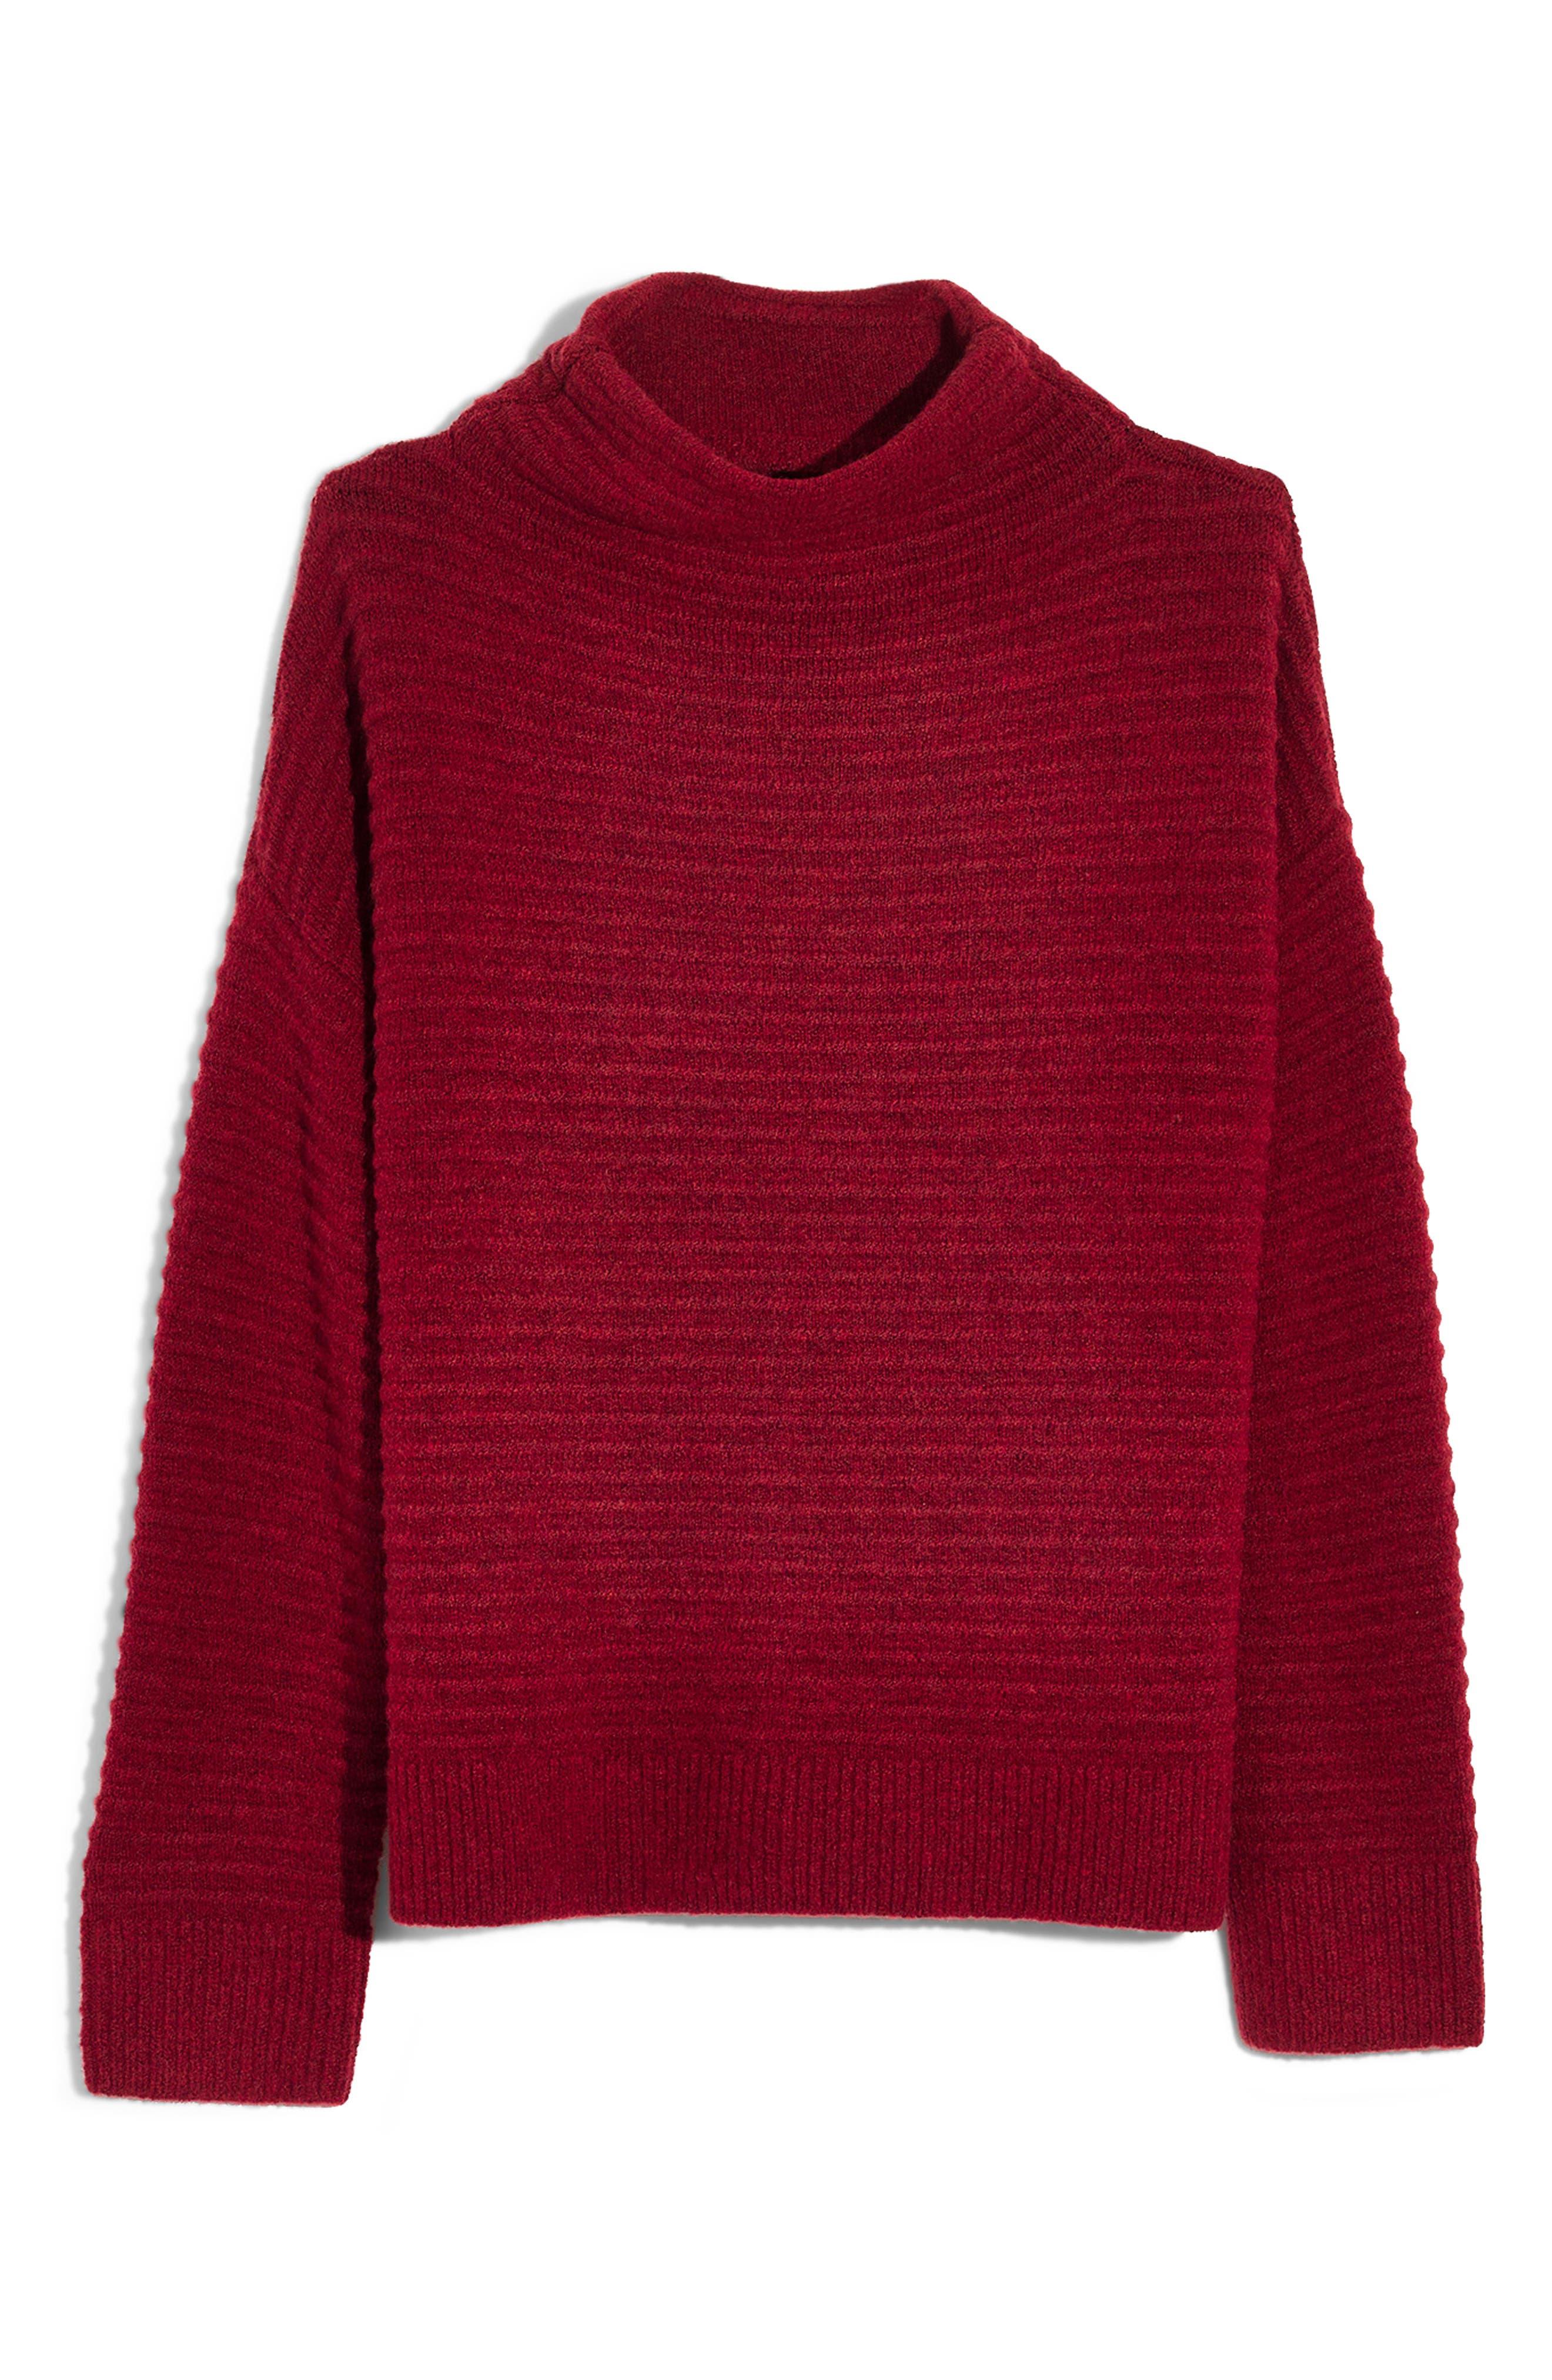 Belmont Mock Neck Sweater,                             Alternate thumbnail 4, color,                             HEATHER CARMINE